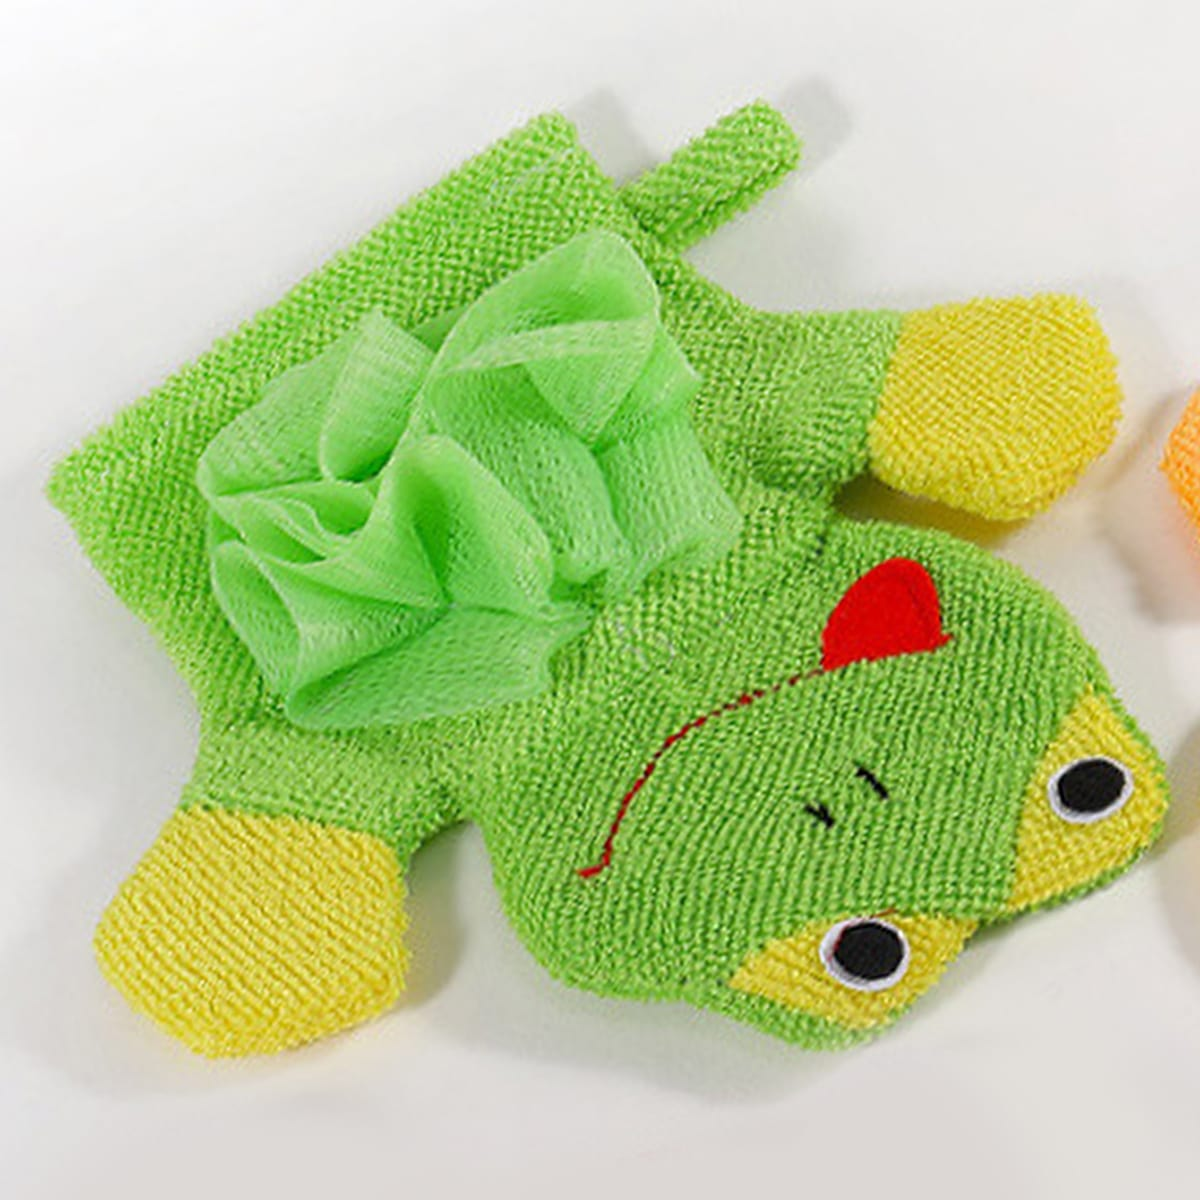 Frog Design Foaming Net Glove